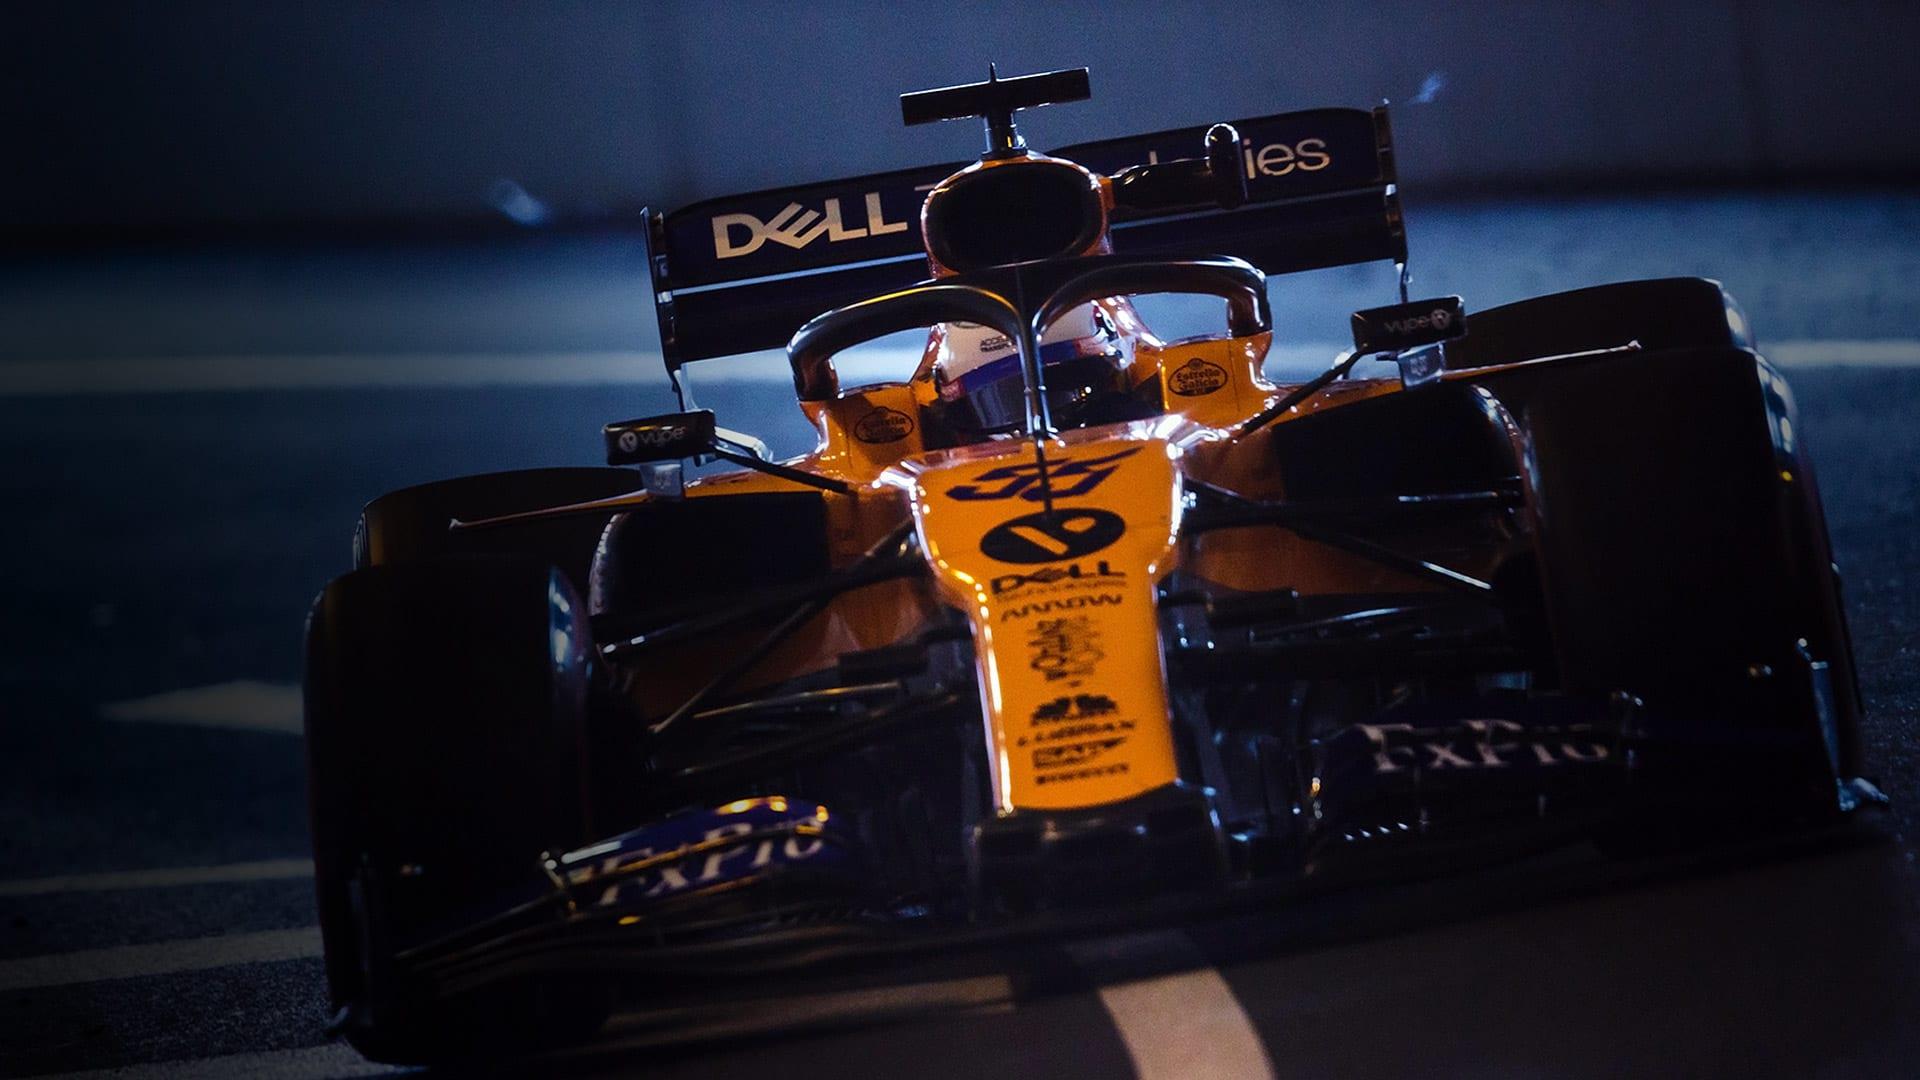 New Mclaren Wind Tunnel Critical To Performance Key Formula 1